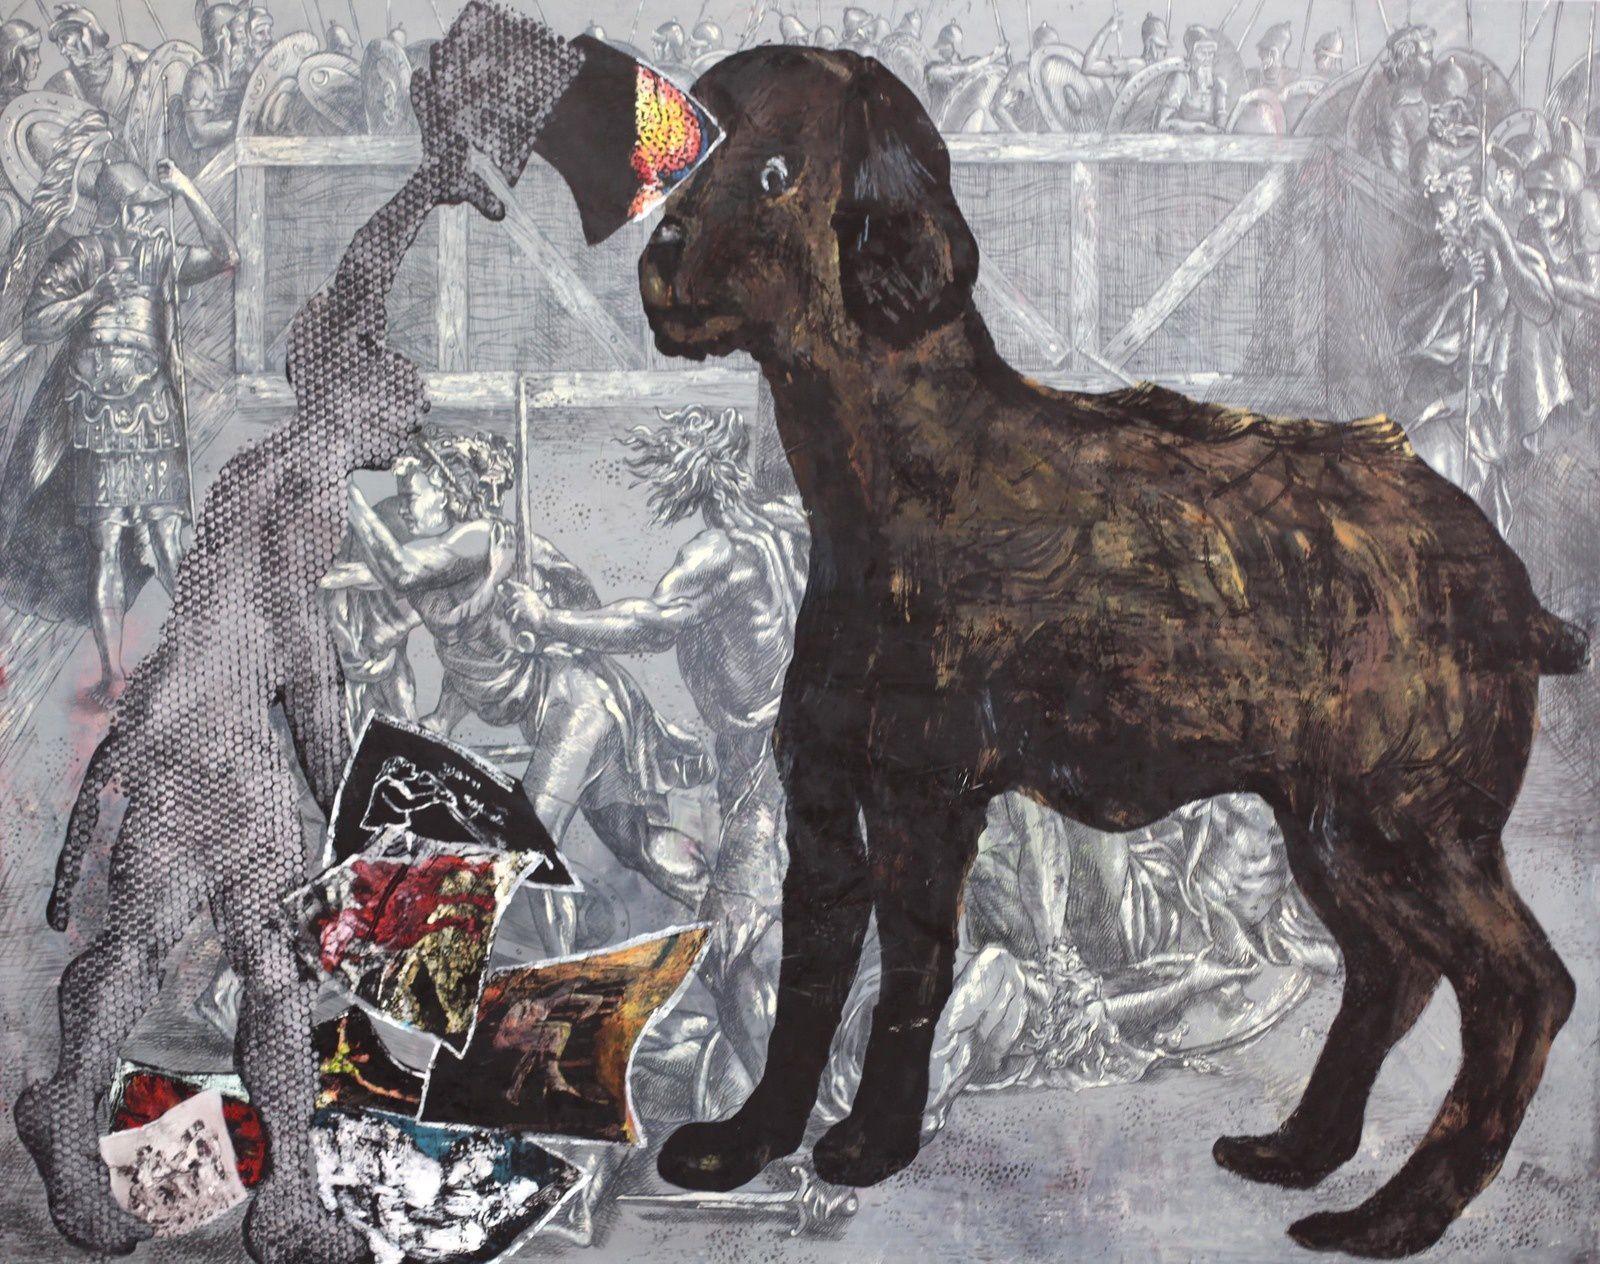 """Ohne Titel"", 2006 de Jörg IMMENDORFF - Courtesy Galerie Suzanne TARASIEVE © Photo Éric Simon"